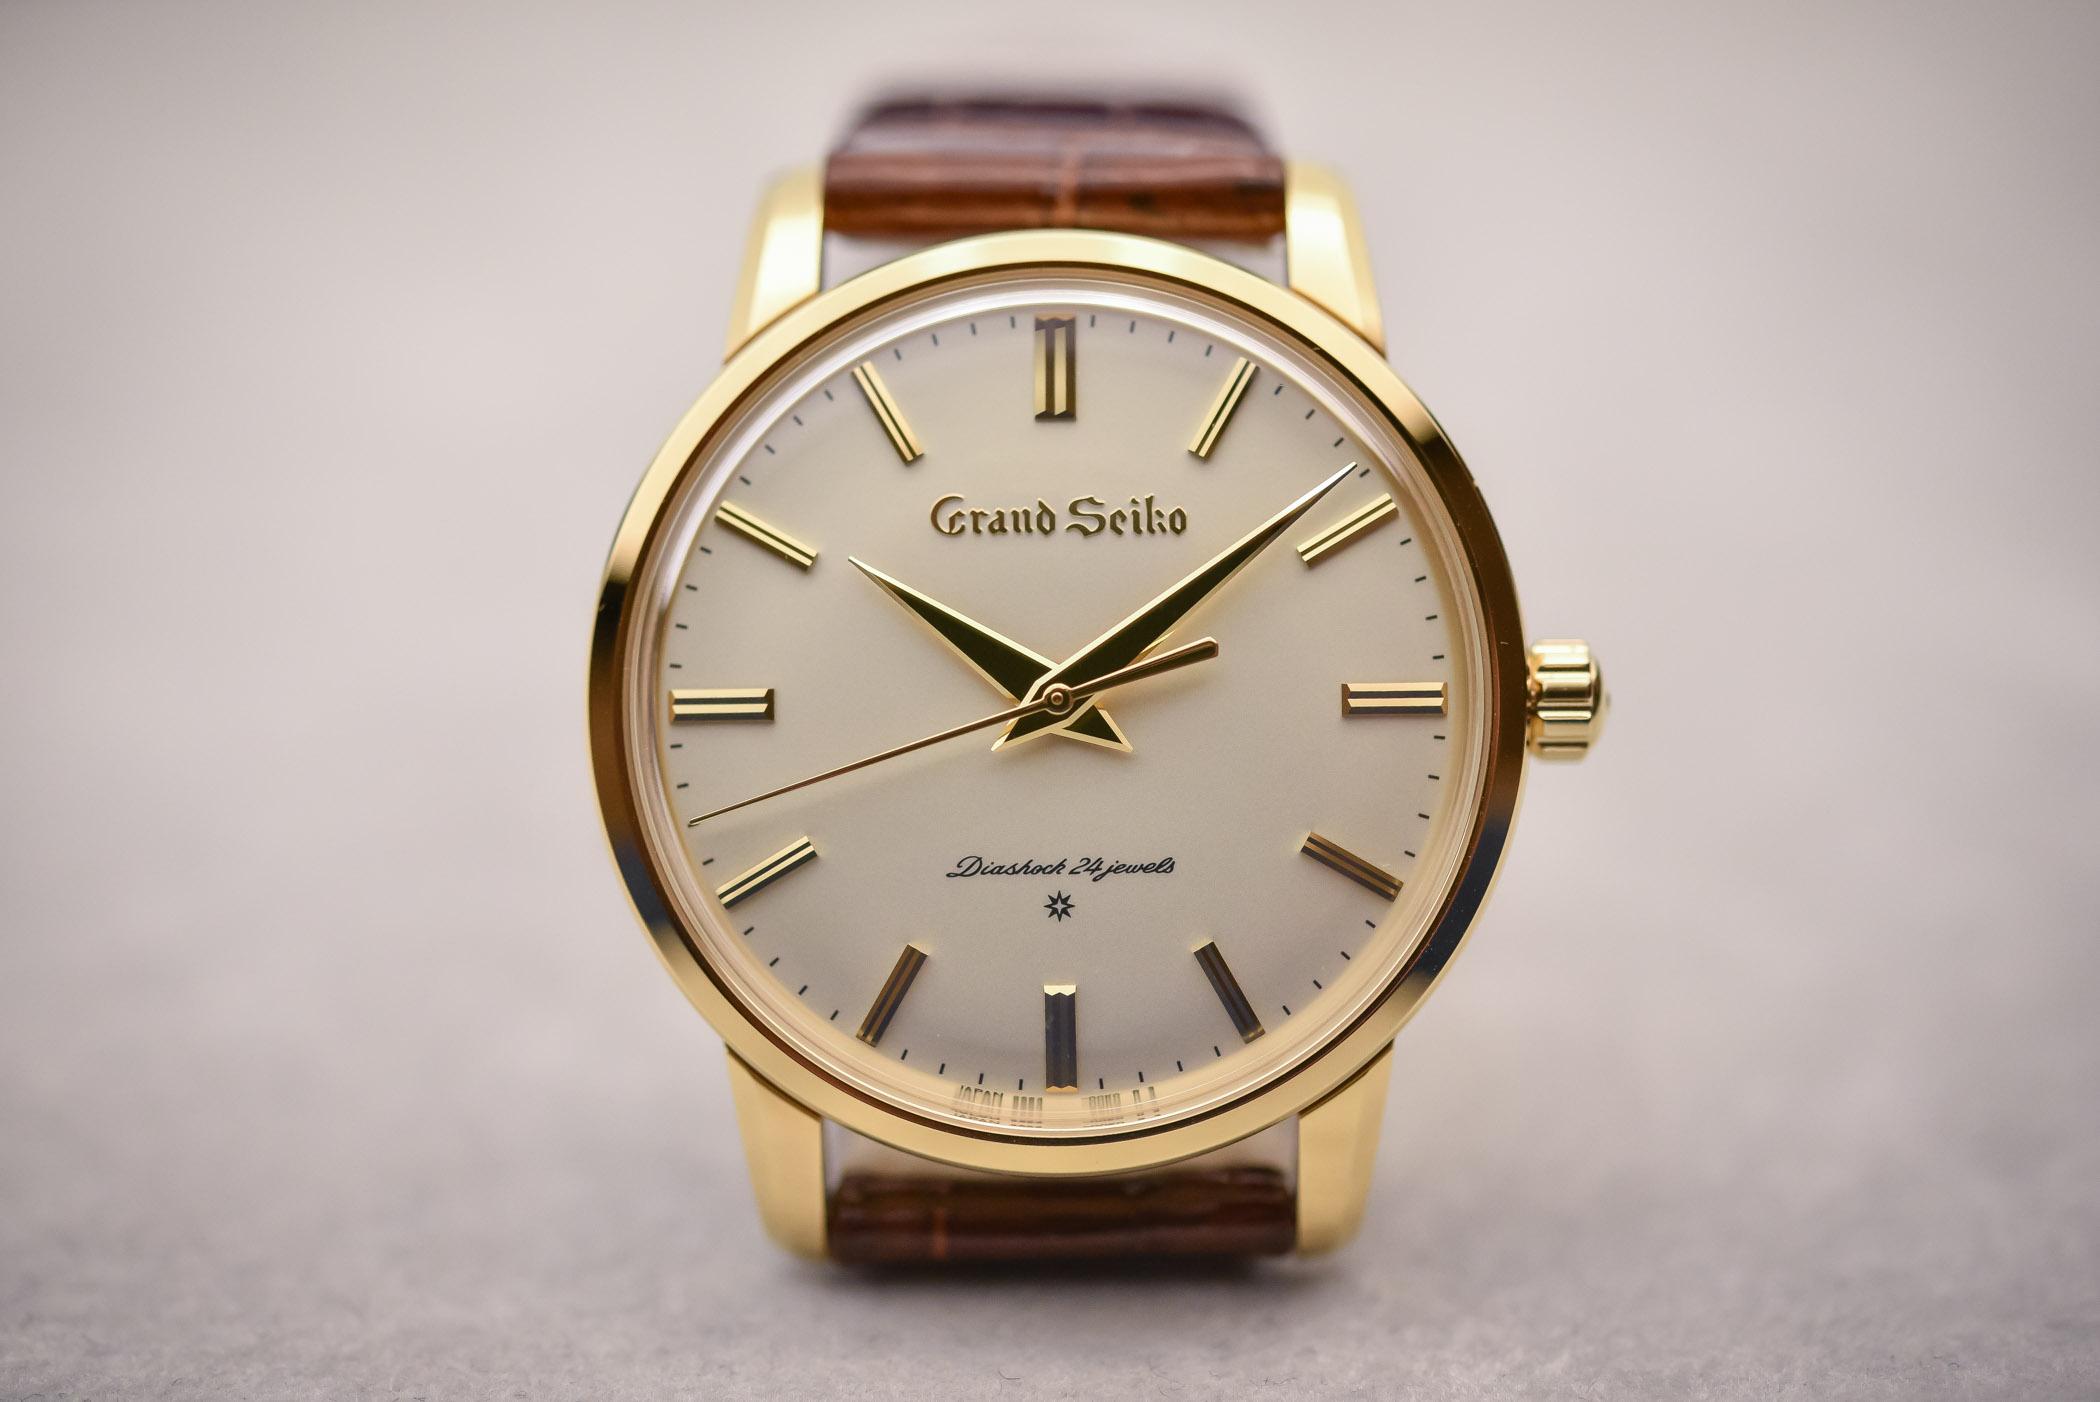 Grand Seiko SBGW252 Recreation First Grand Seiko Watch